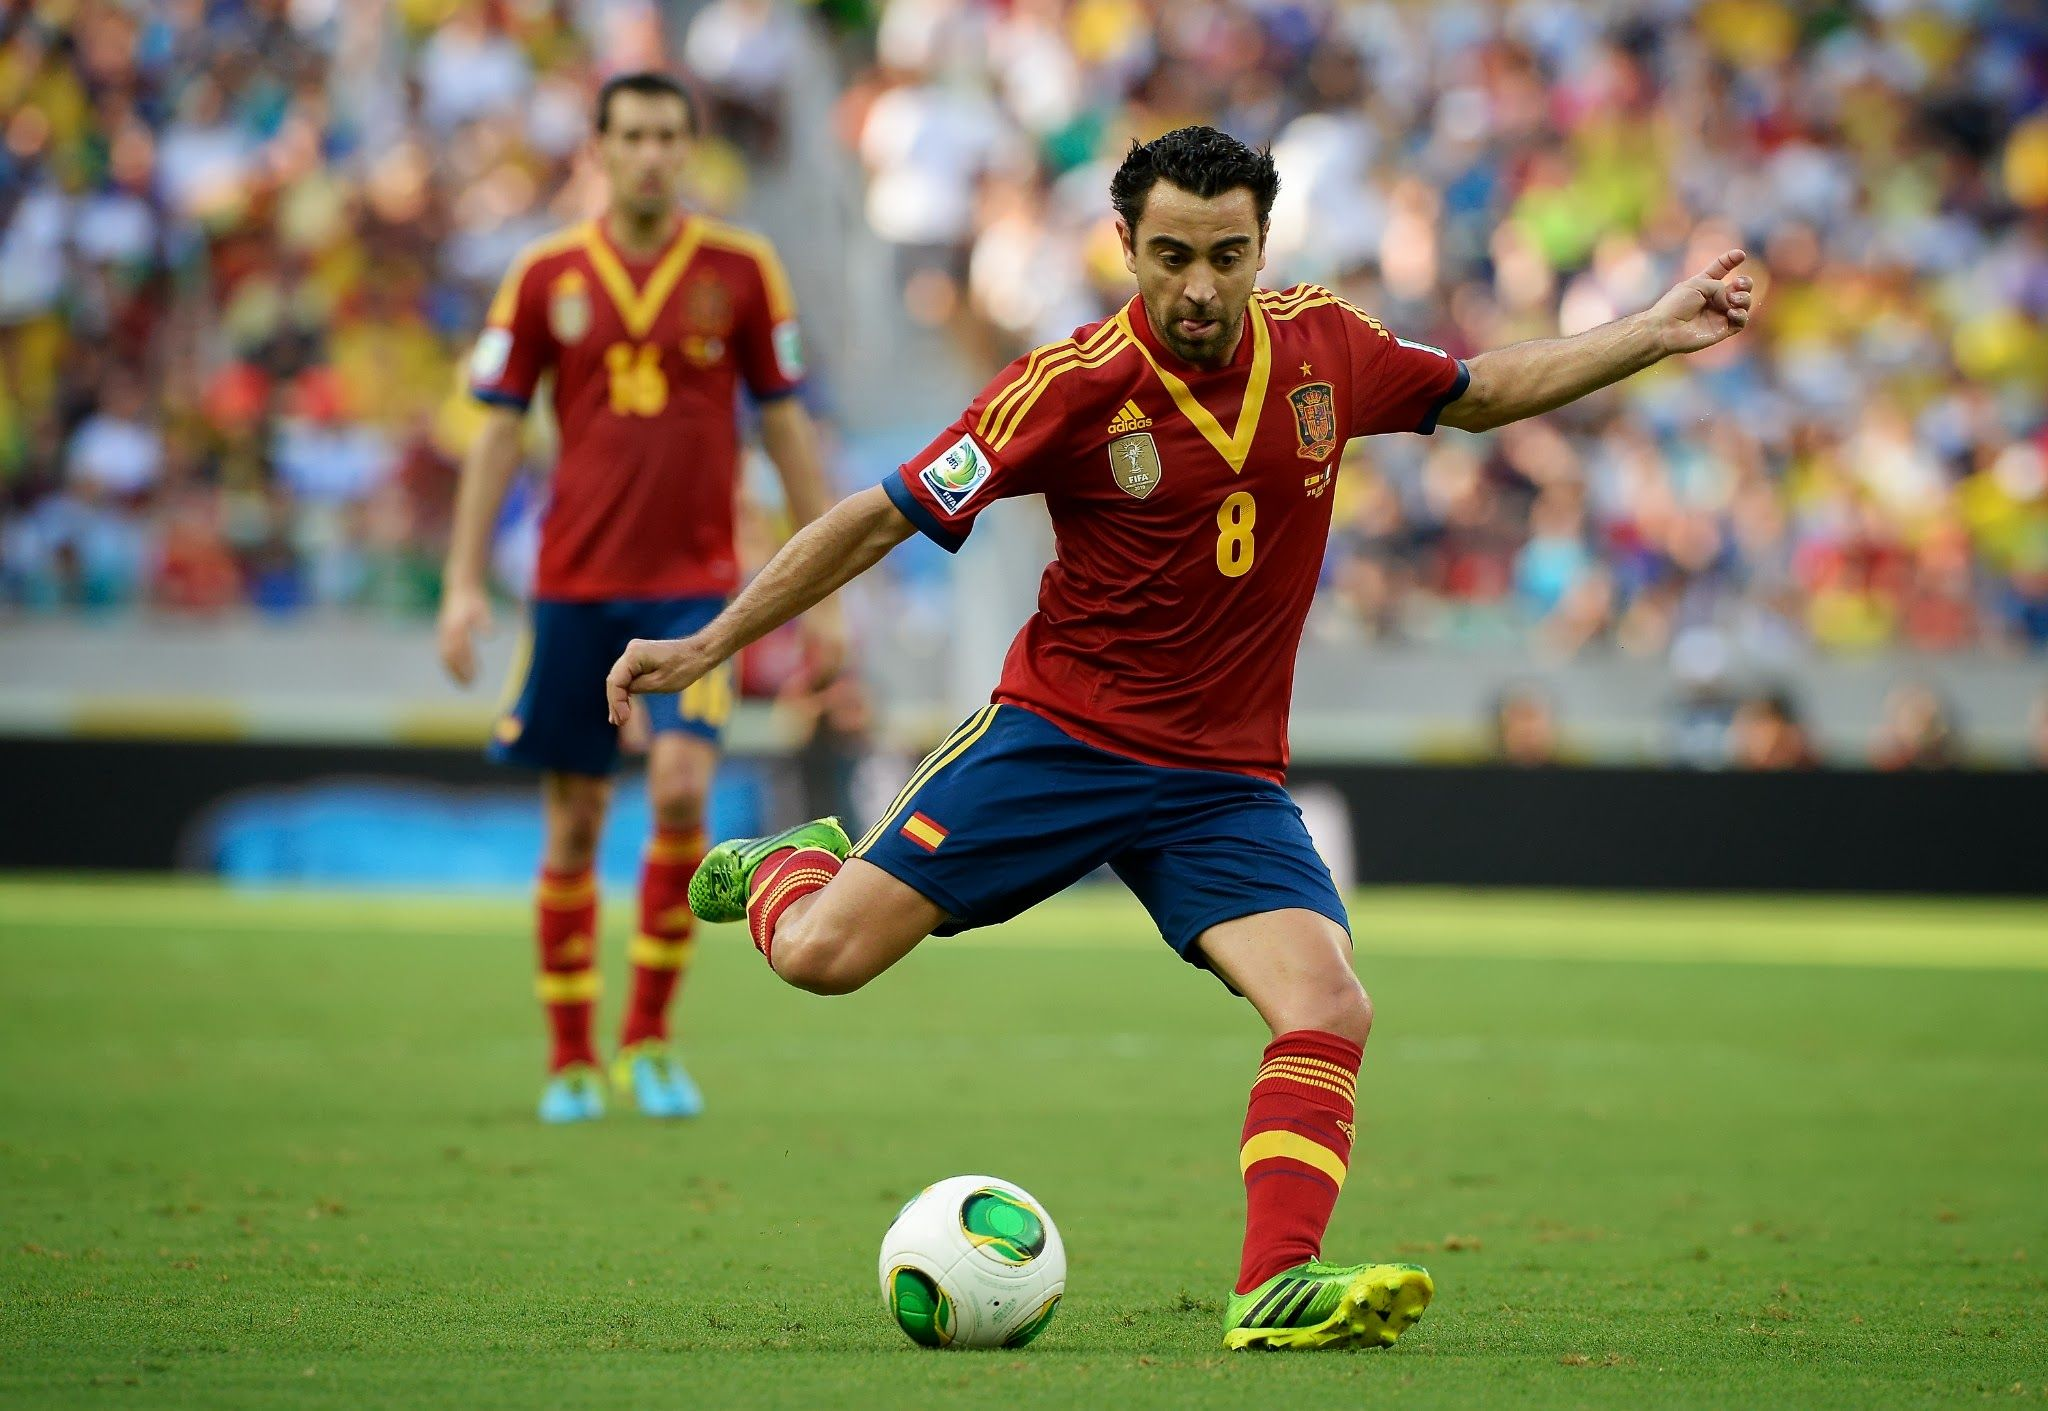 Xavi Spain Vs Italy Confederations Cup 2013 Fifa Football Spain Football National Football